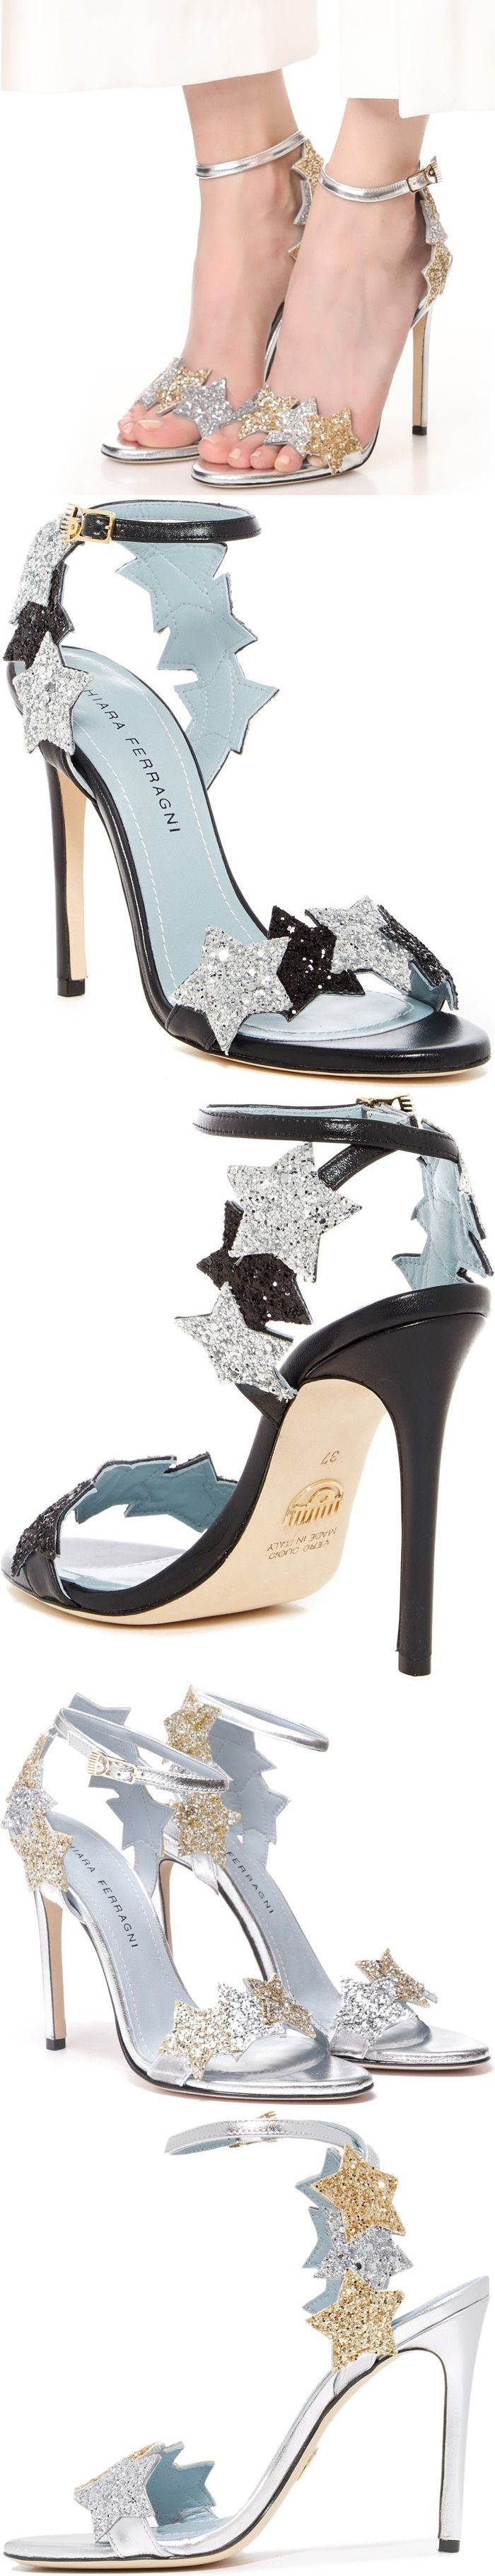 Glitter-encrusted stars trim the slim straps on these eye-catching Chiara Ferragni 'Star' sandals that we spotted on Heidi Klum